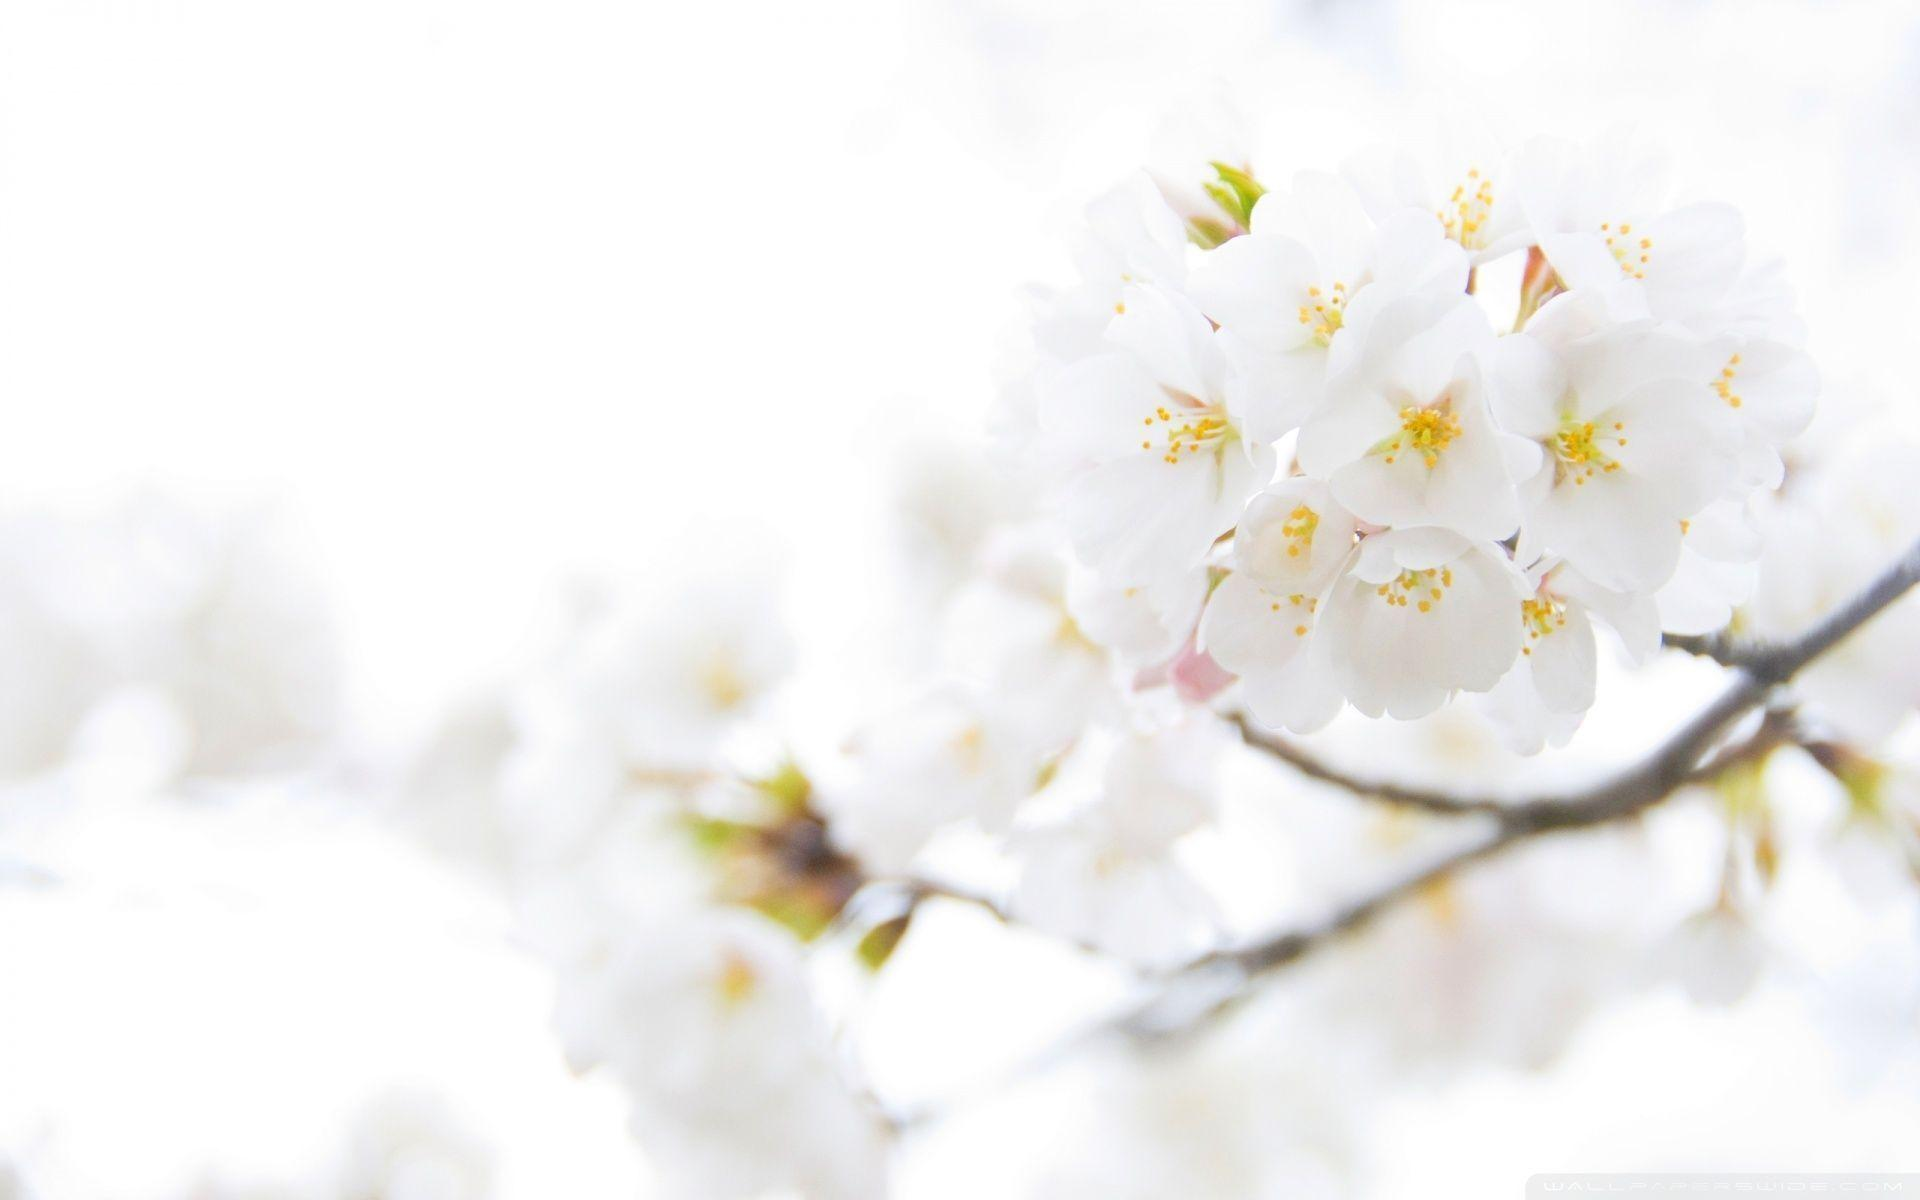 White Flower Wallpaper – Choosing the Right Design For Your Home